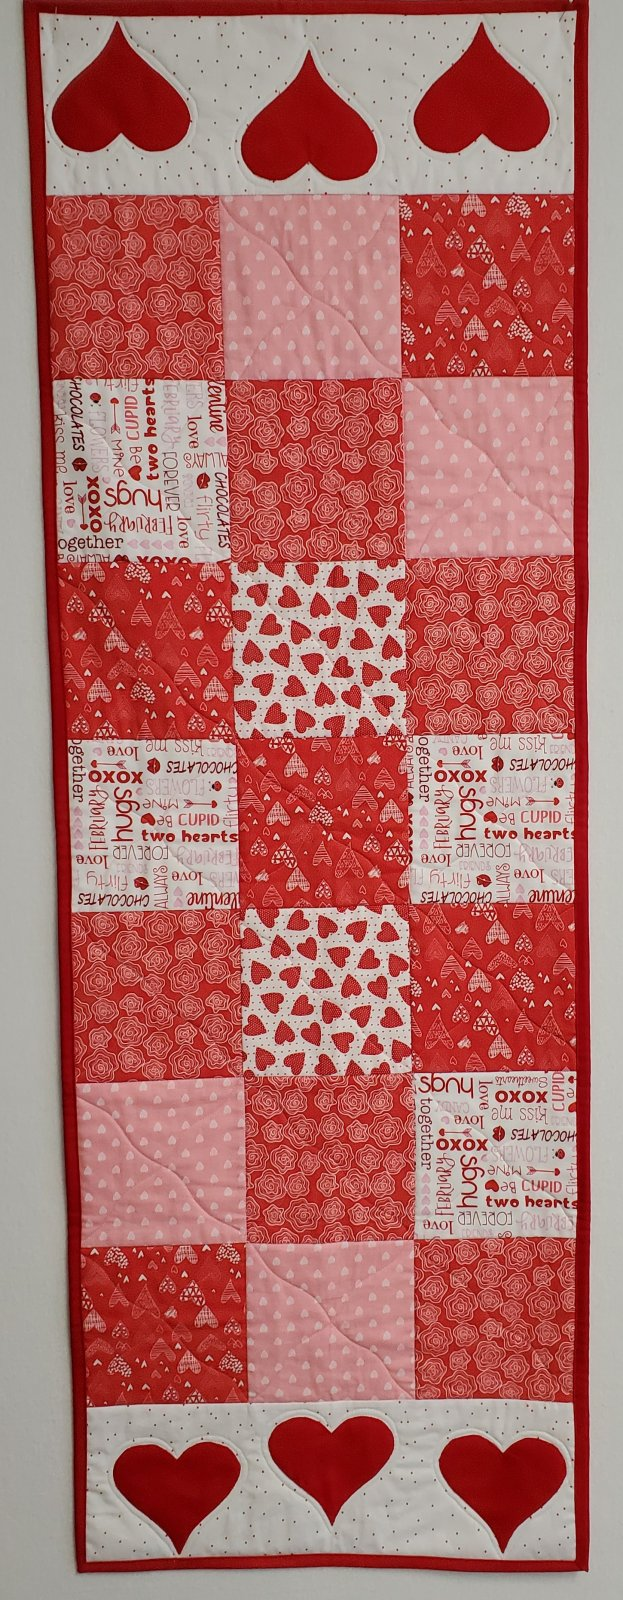 Valentine's Table Runner Pattern